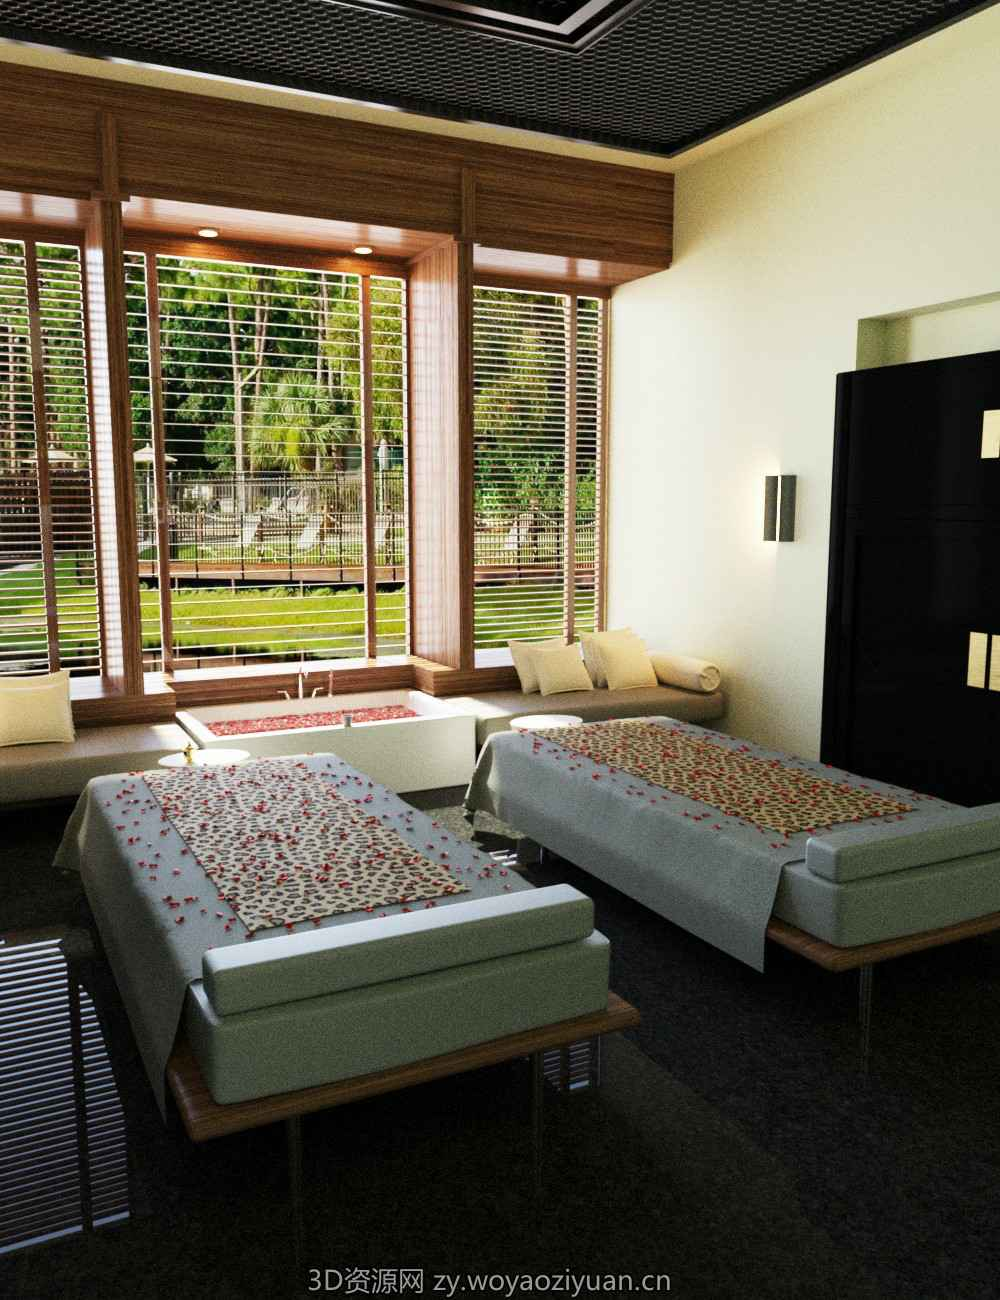 Spa and Massage Room